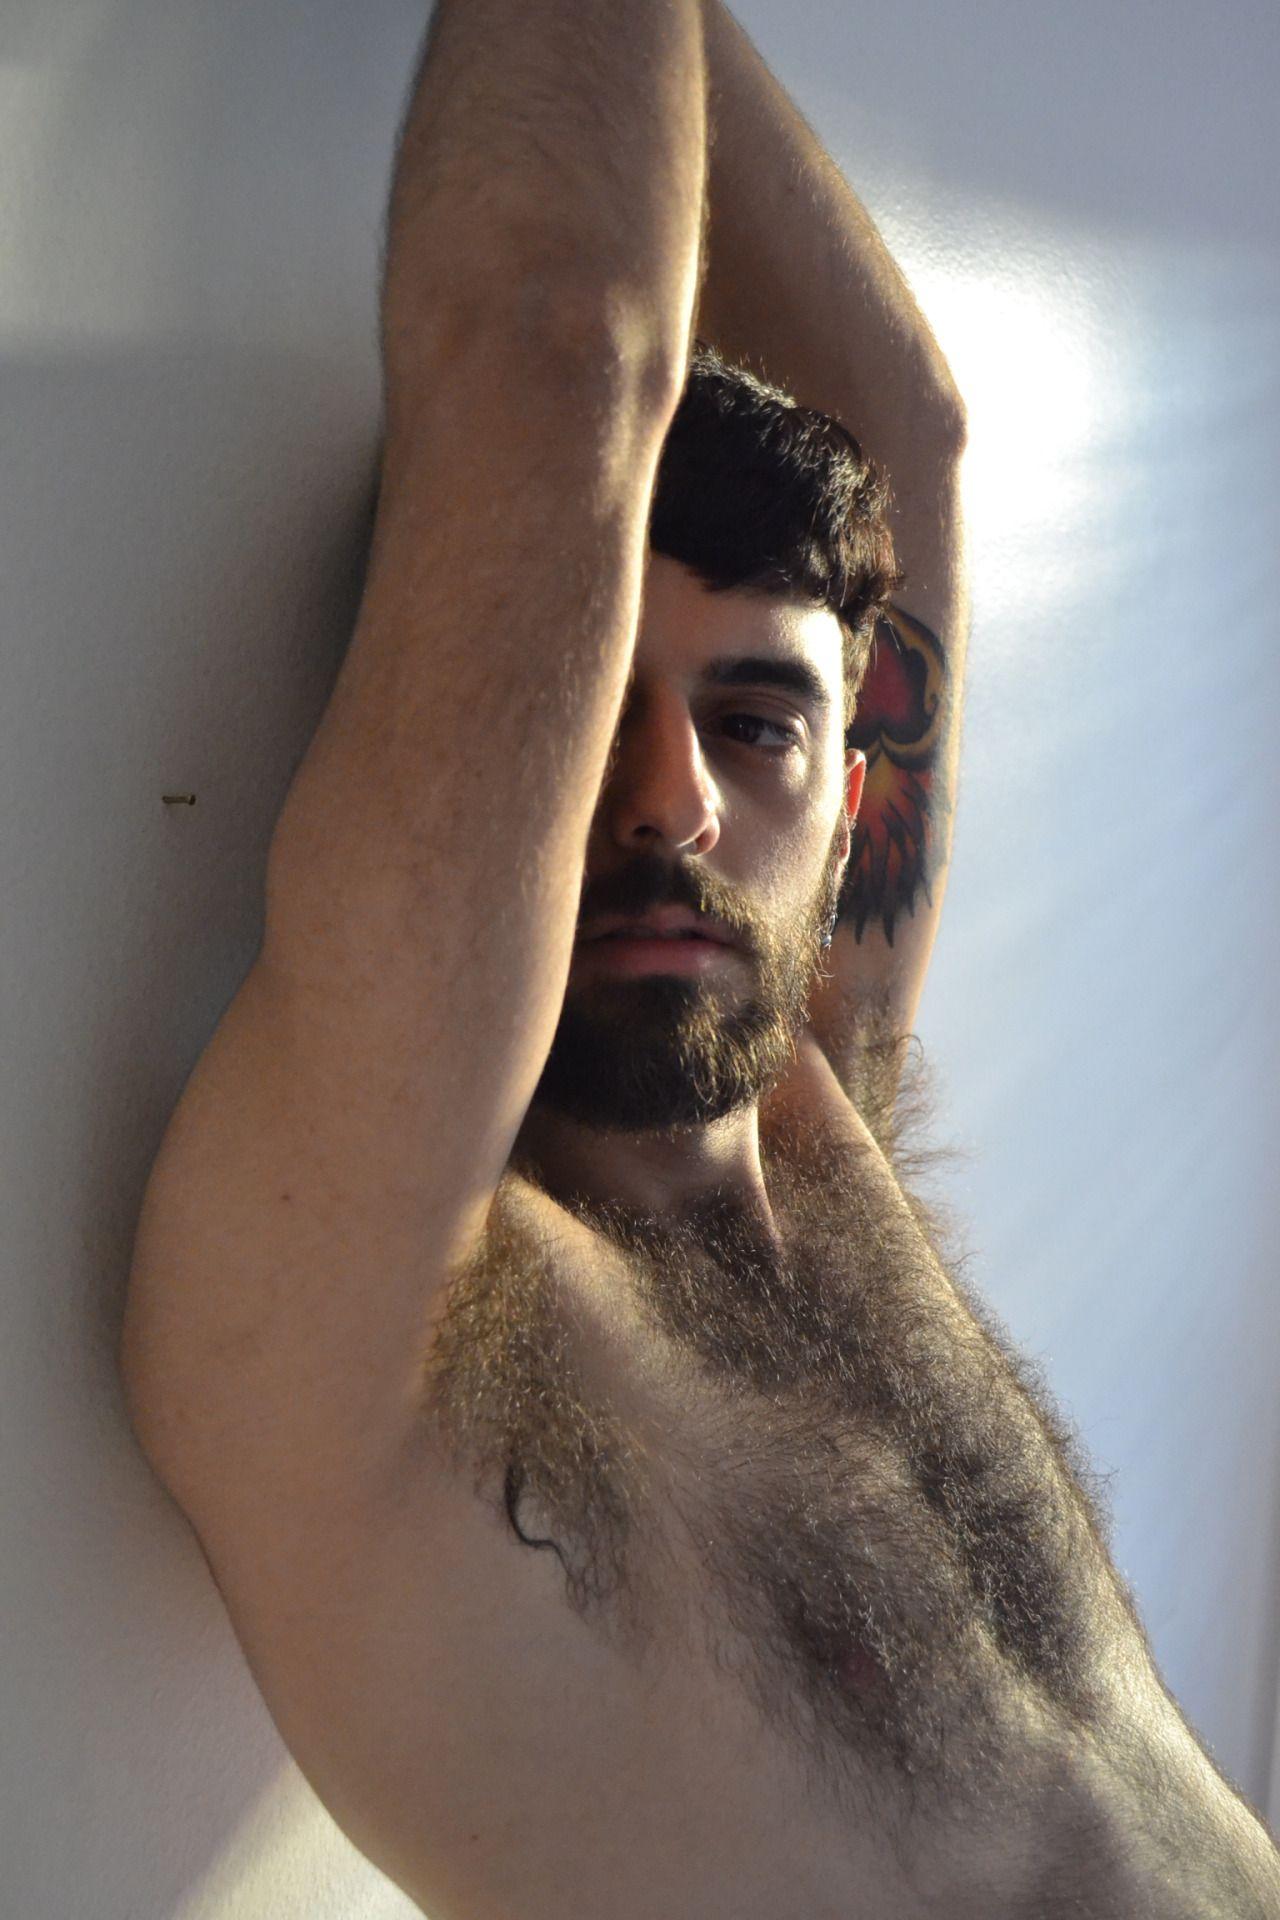 Gay Foot Fetish Tumblr regarding Épinglé par sean mairtin rua sur / eros / fetish / armpits, feet